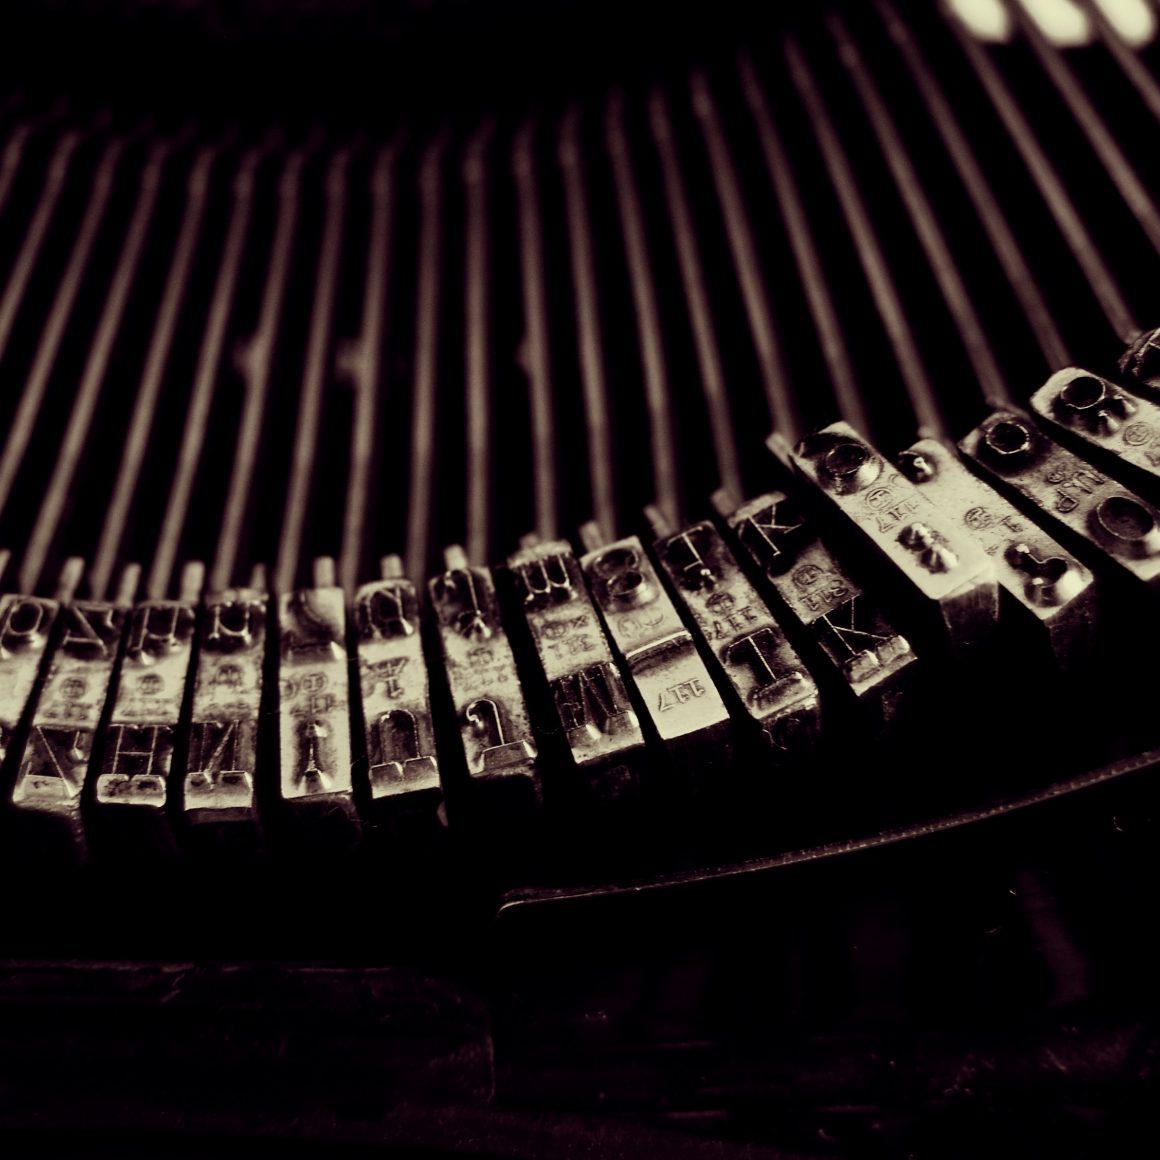 SEO klucove slova a klucove frazy